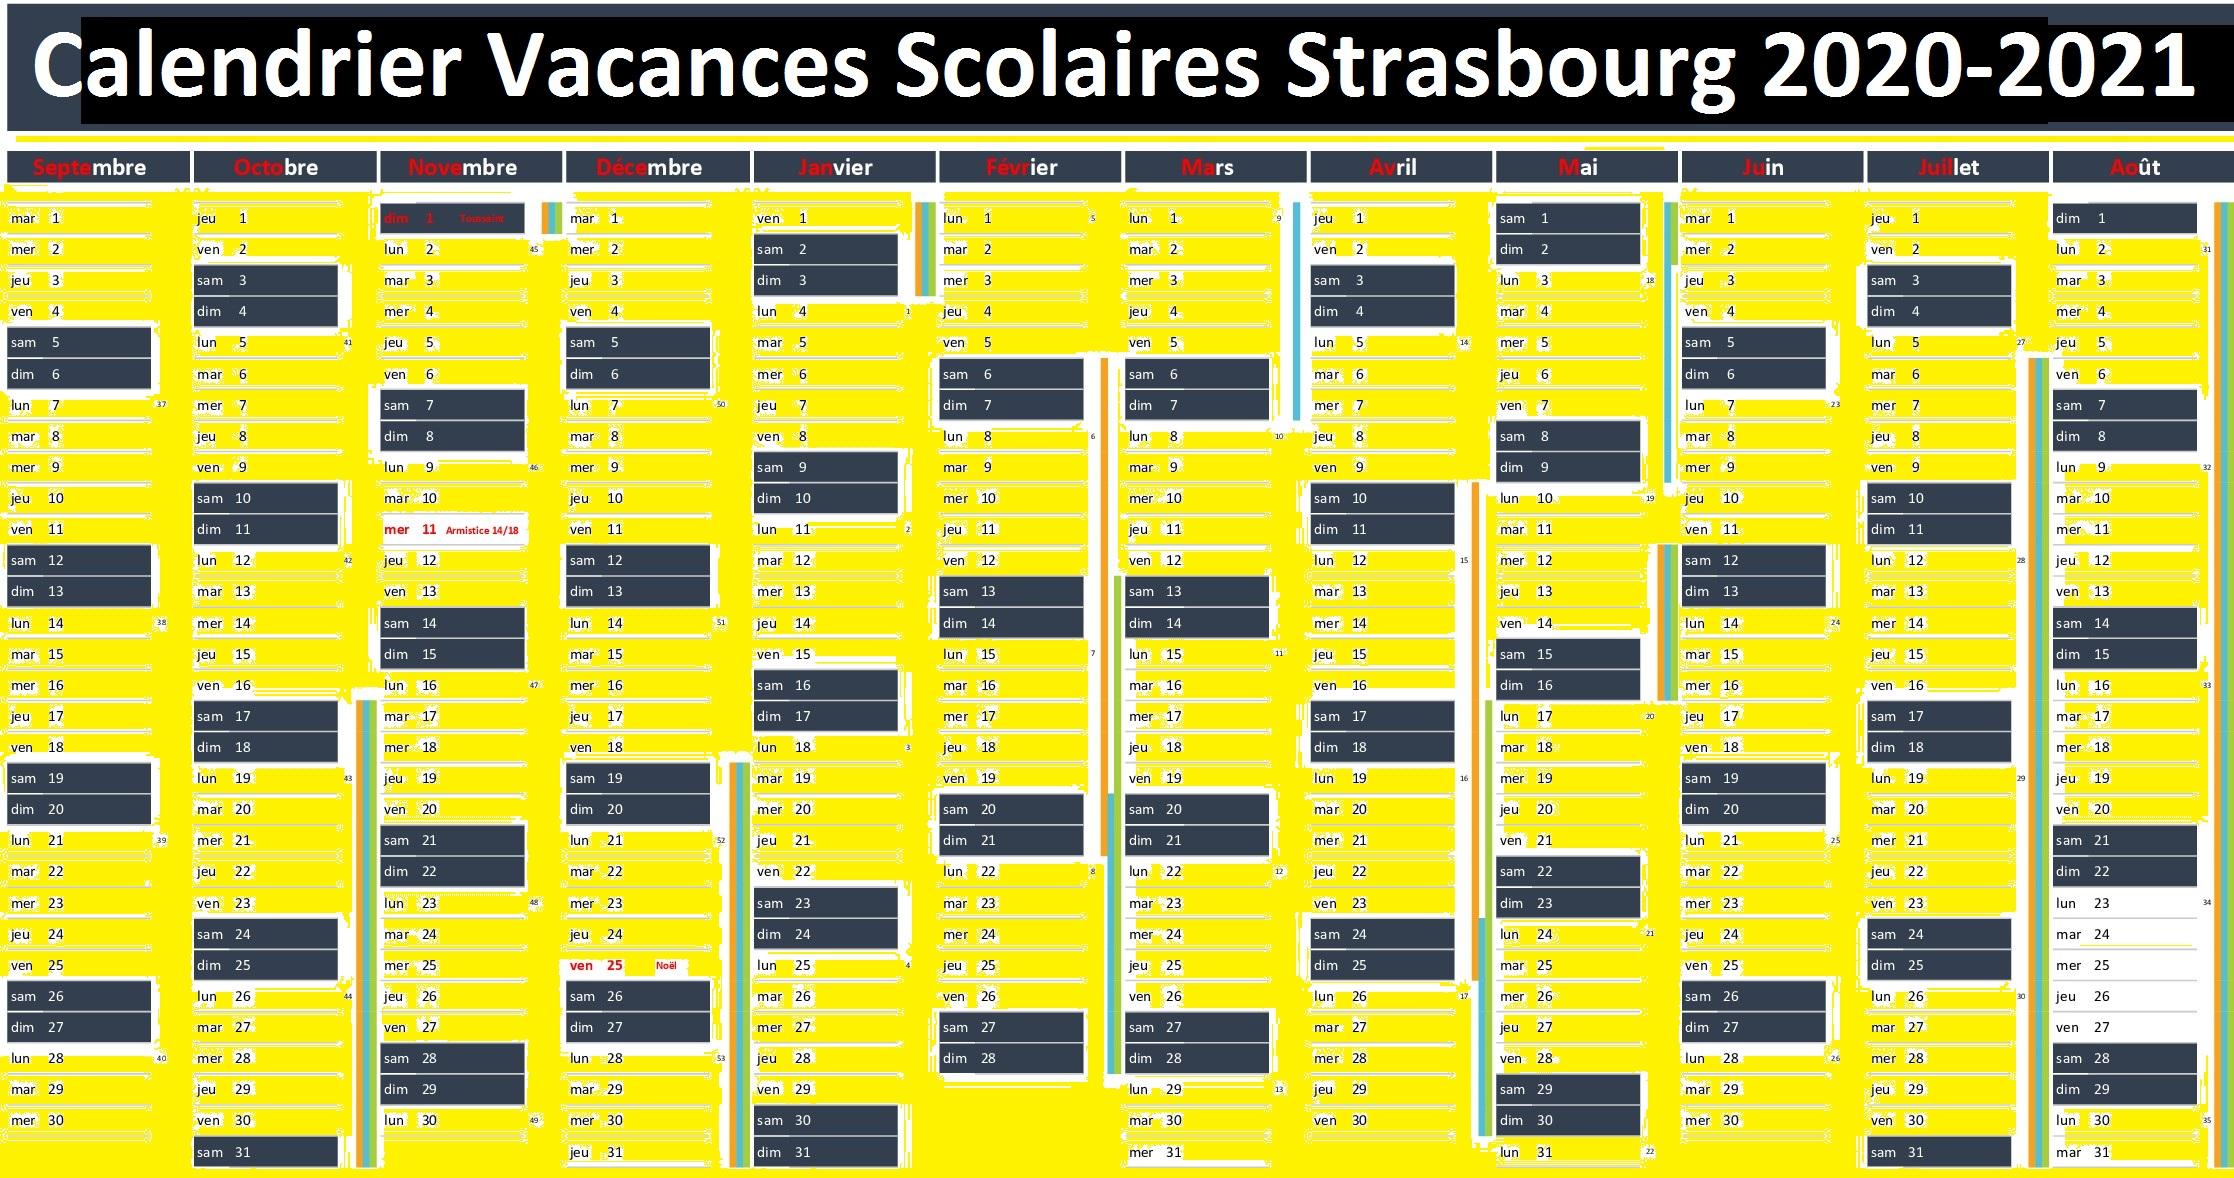 Dates Calendrier Vacances Scolaires Strasbourg 2020